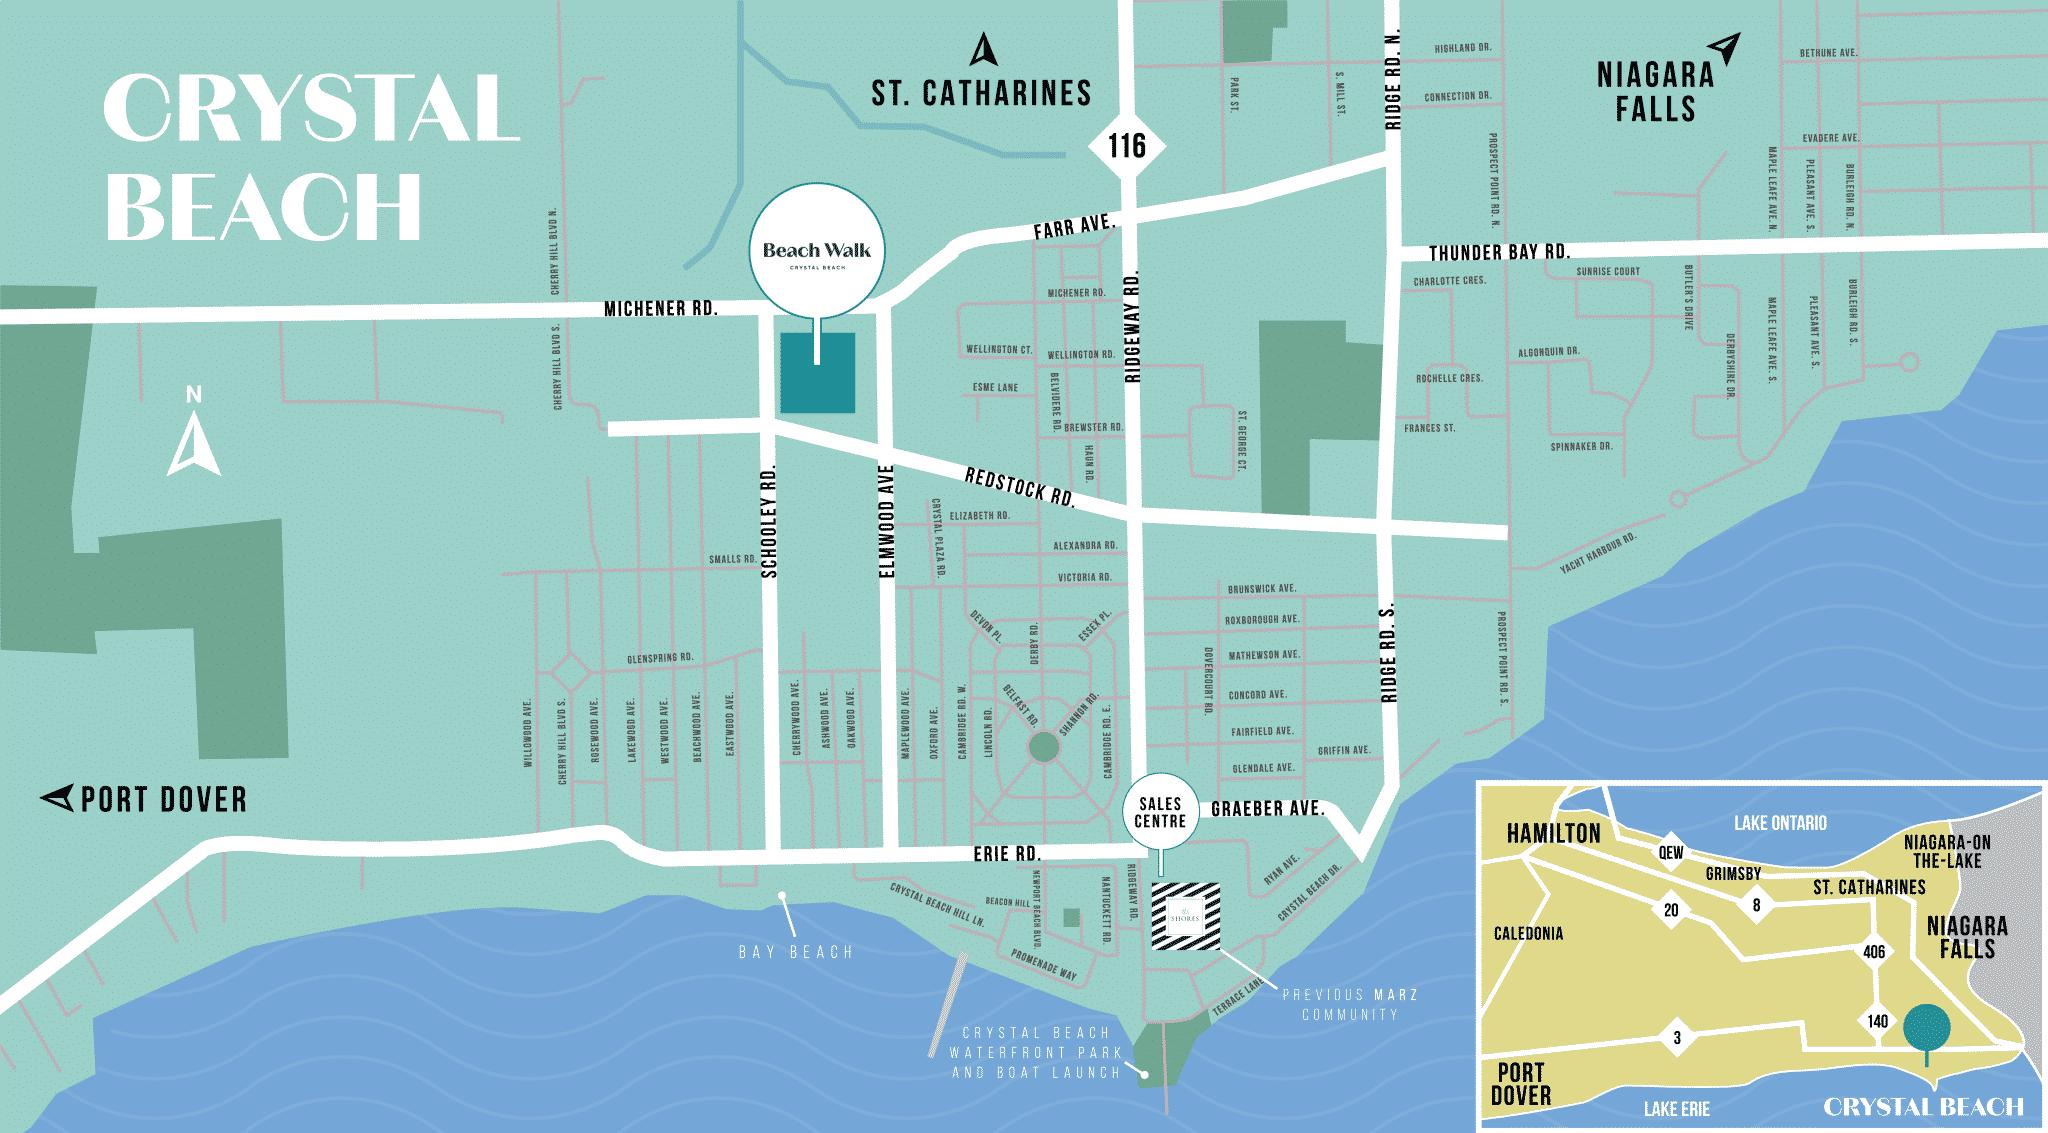 Image of the Beachwalk map